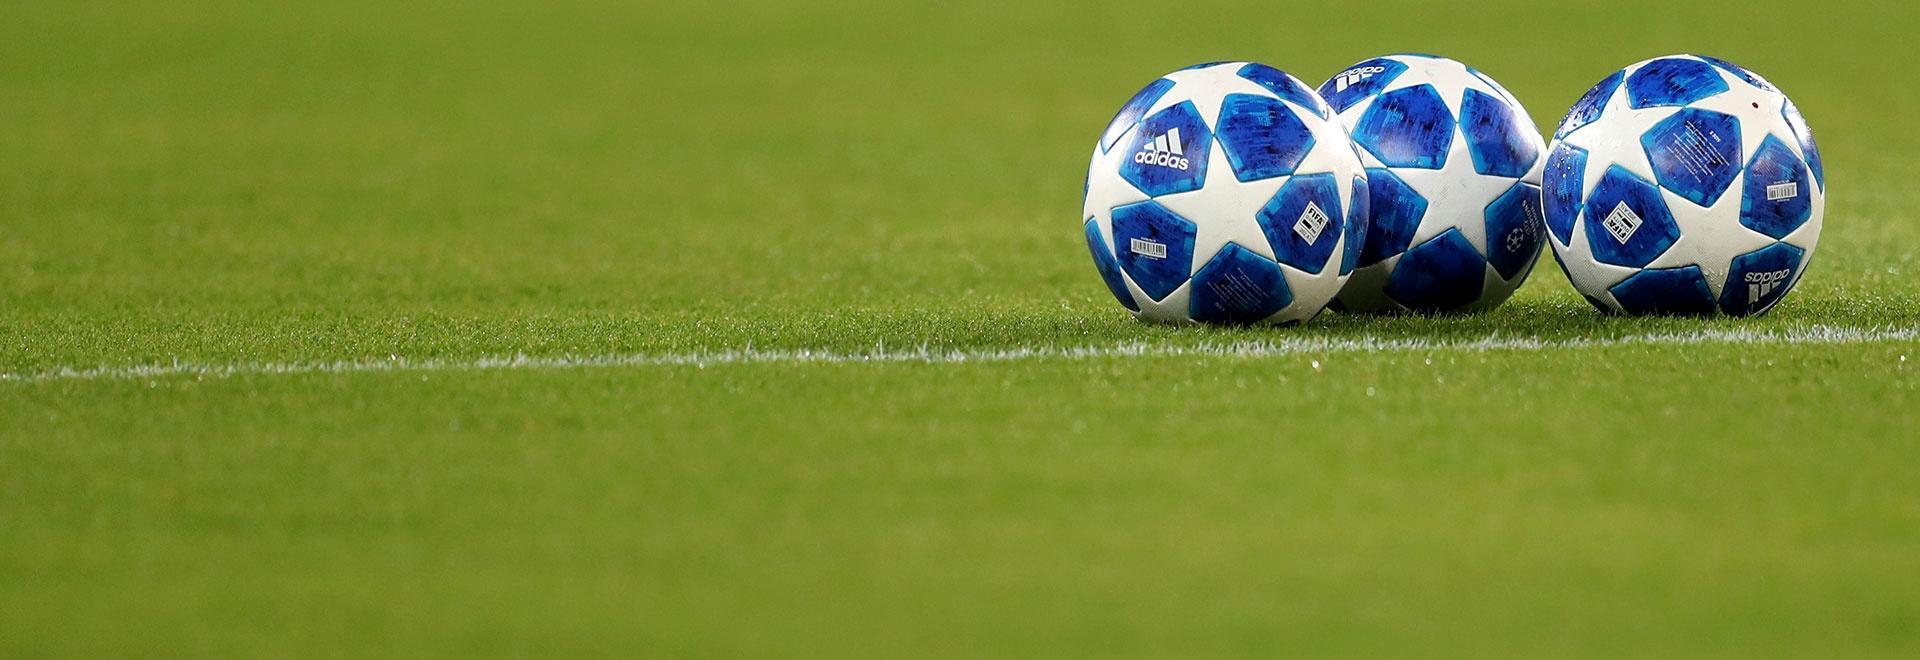 Real Madrid - Roma 28/09/04